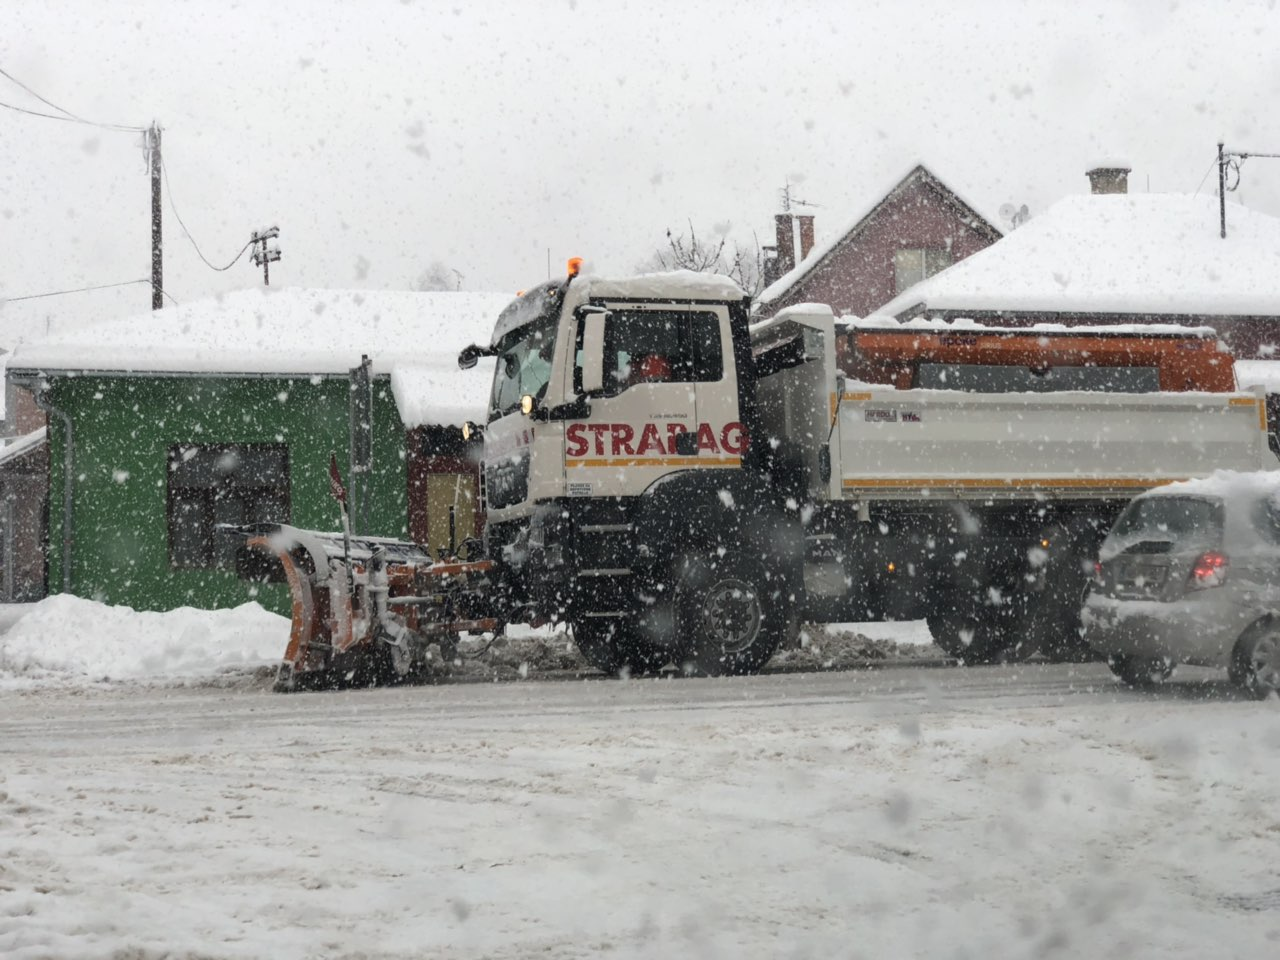 Ilustracija, arhivska fotografija, čišćenje snega, foto: Marko Miladinović, portal ,,Knjaževačke novine''